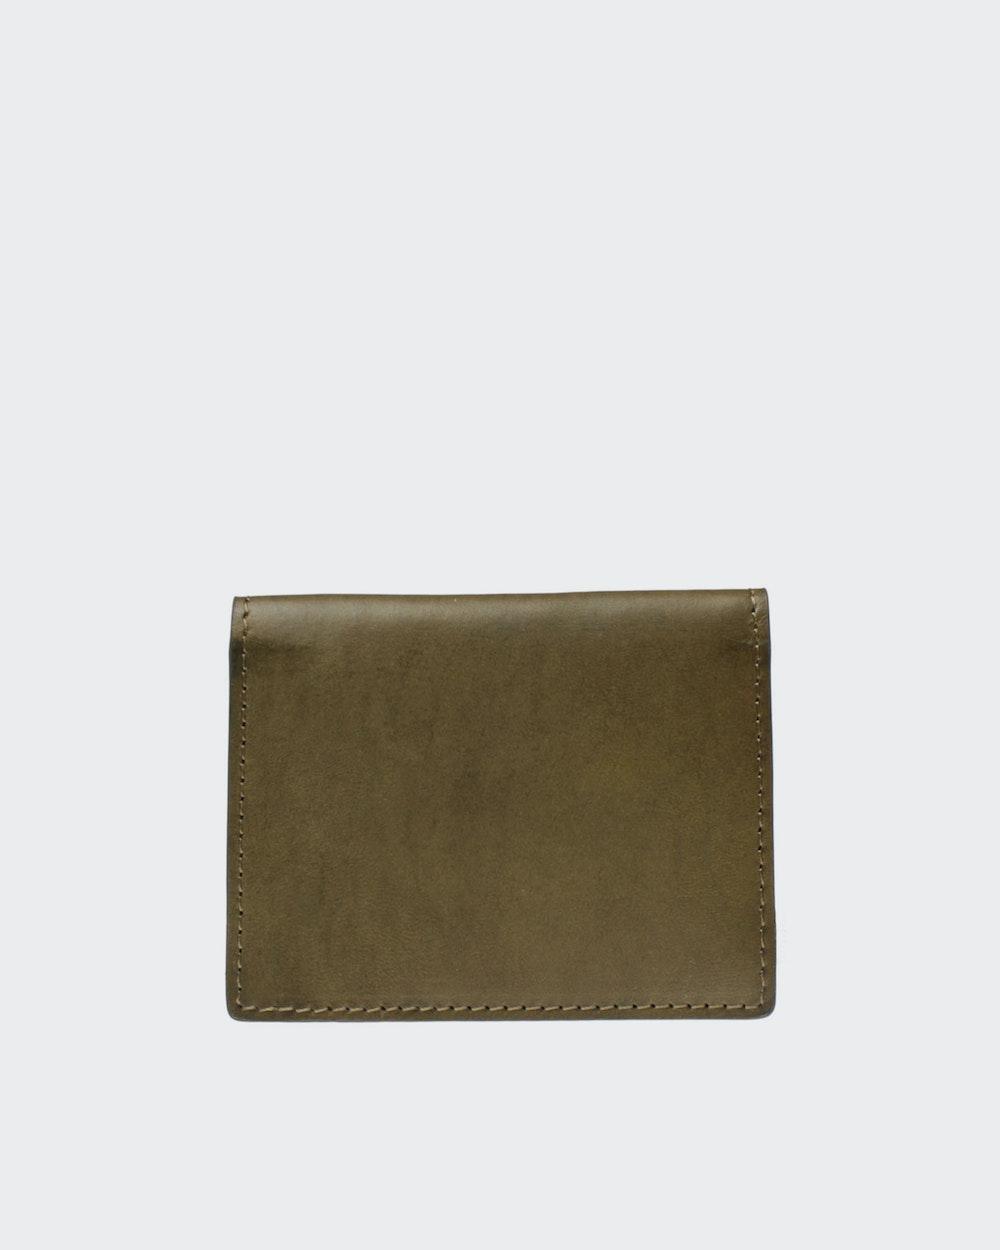 Ted wallet Green Oscar Jacobson